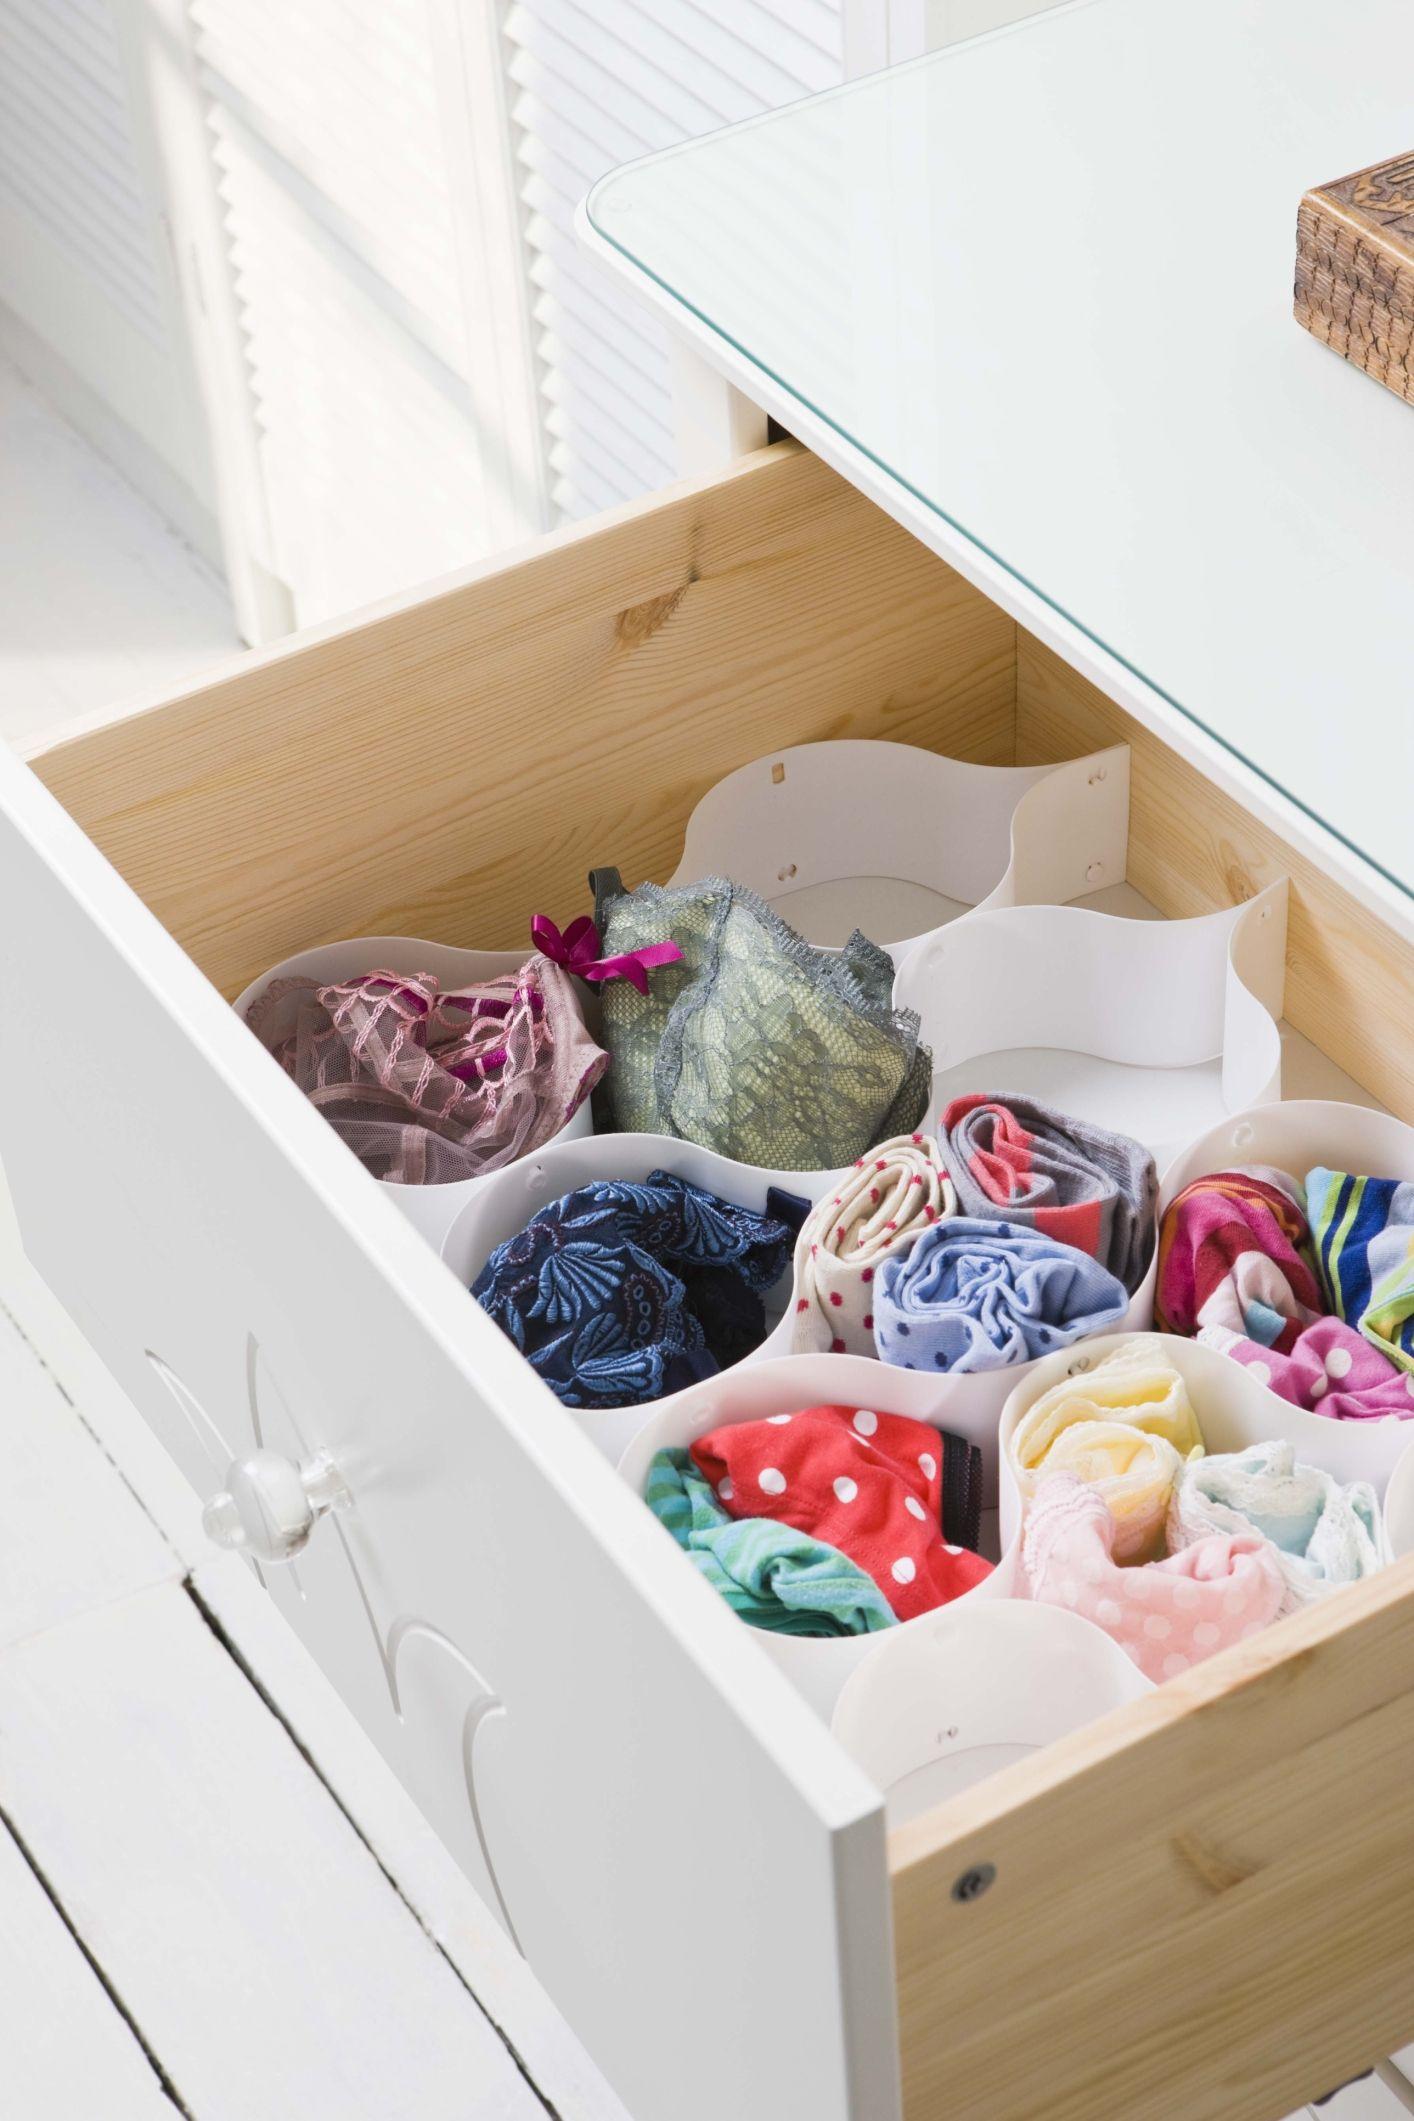 Create Your Own Cardboard Box Desk Drawer Organizers Diy